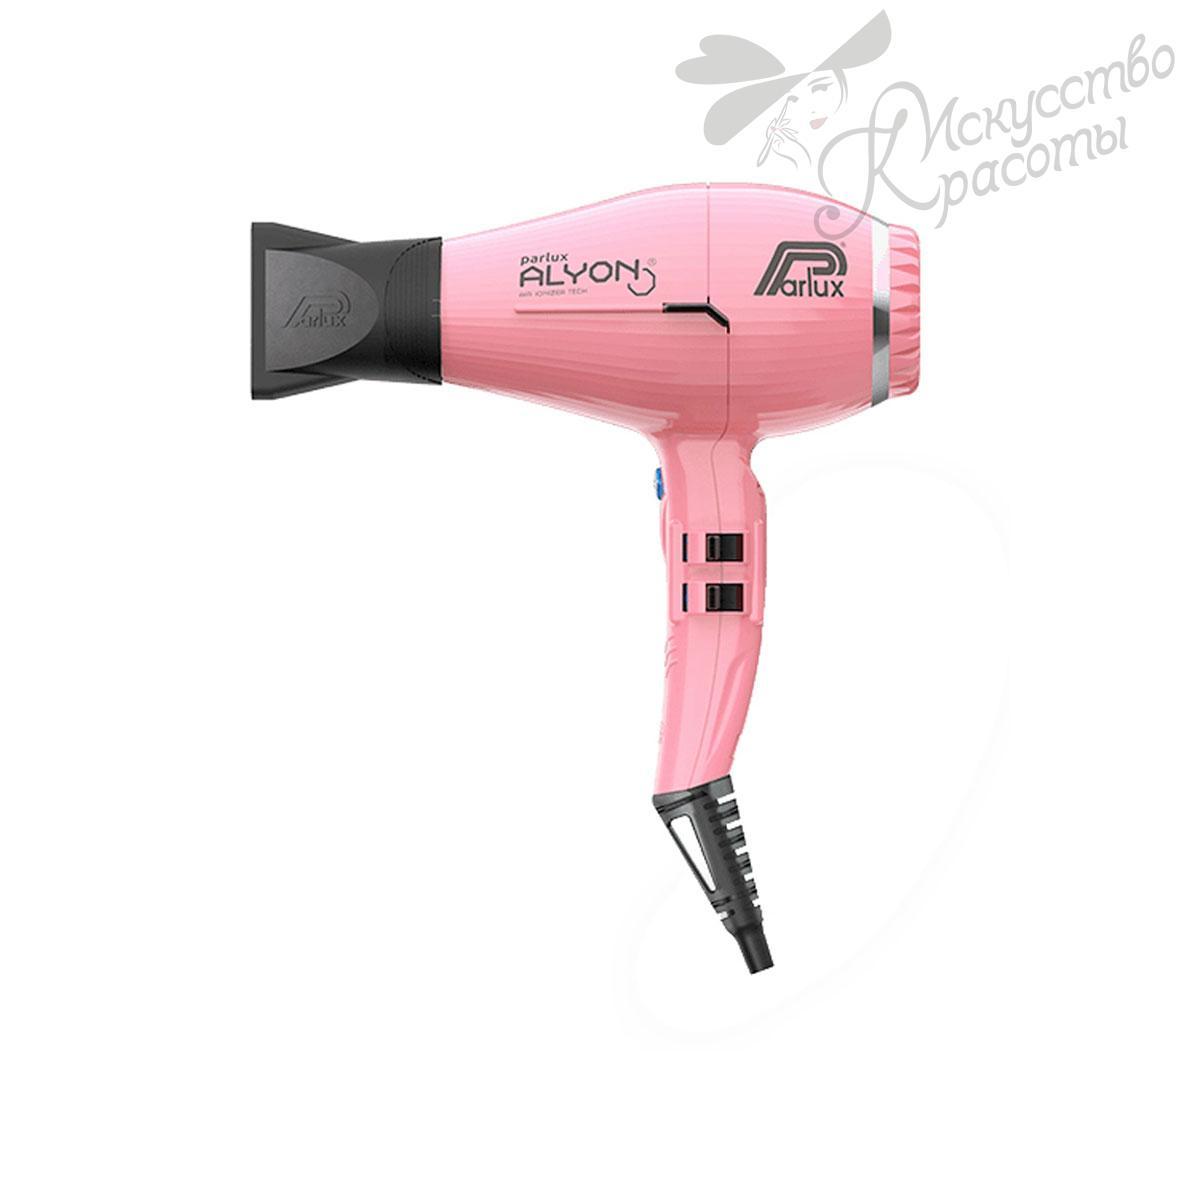 Фен для волос Parlux Alyon Pink 2250 W